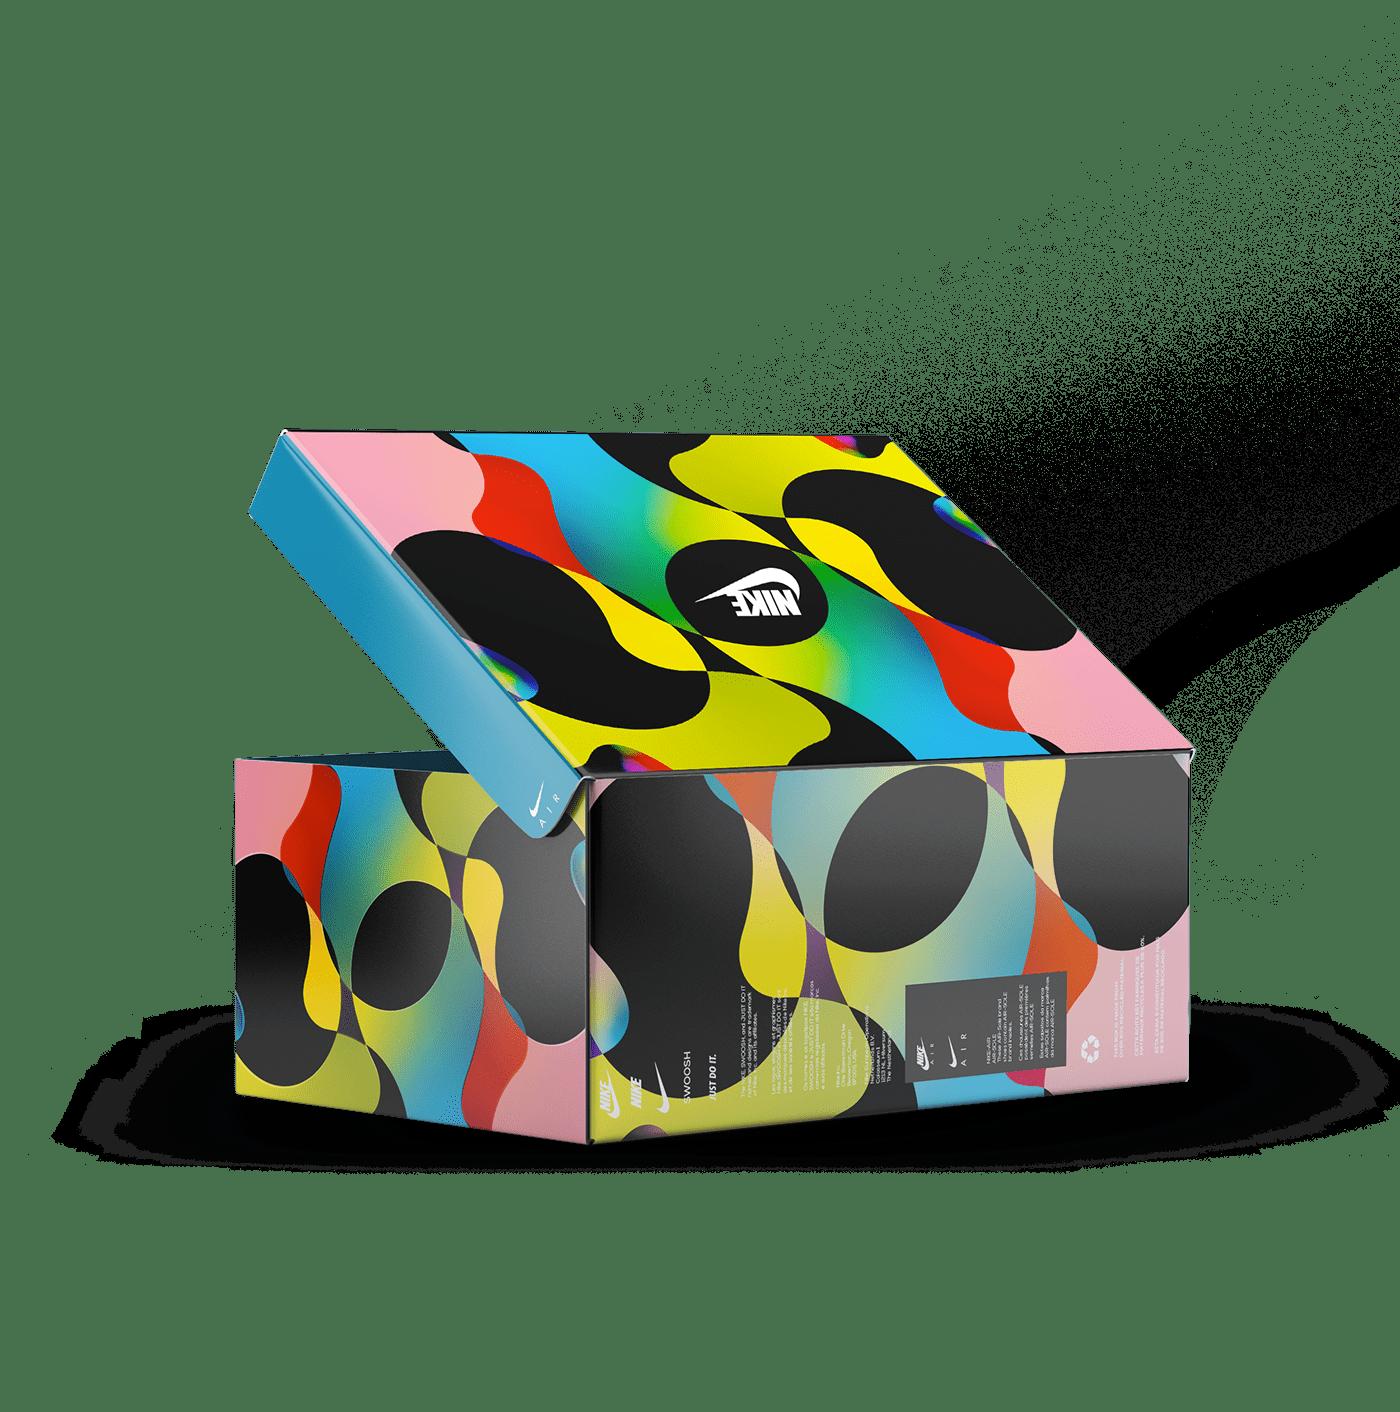 fluide Couleur degrader futuriste Nike nike react 270 Illustrator charte graphique graphic Halo